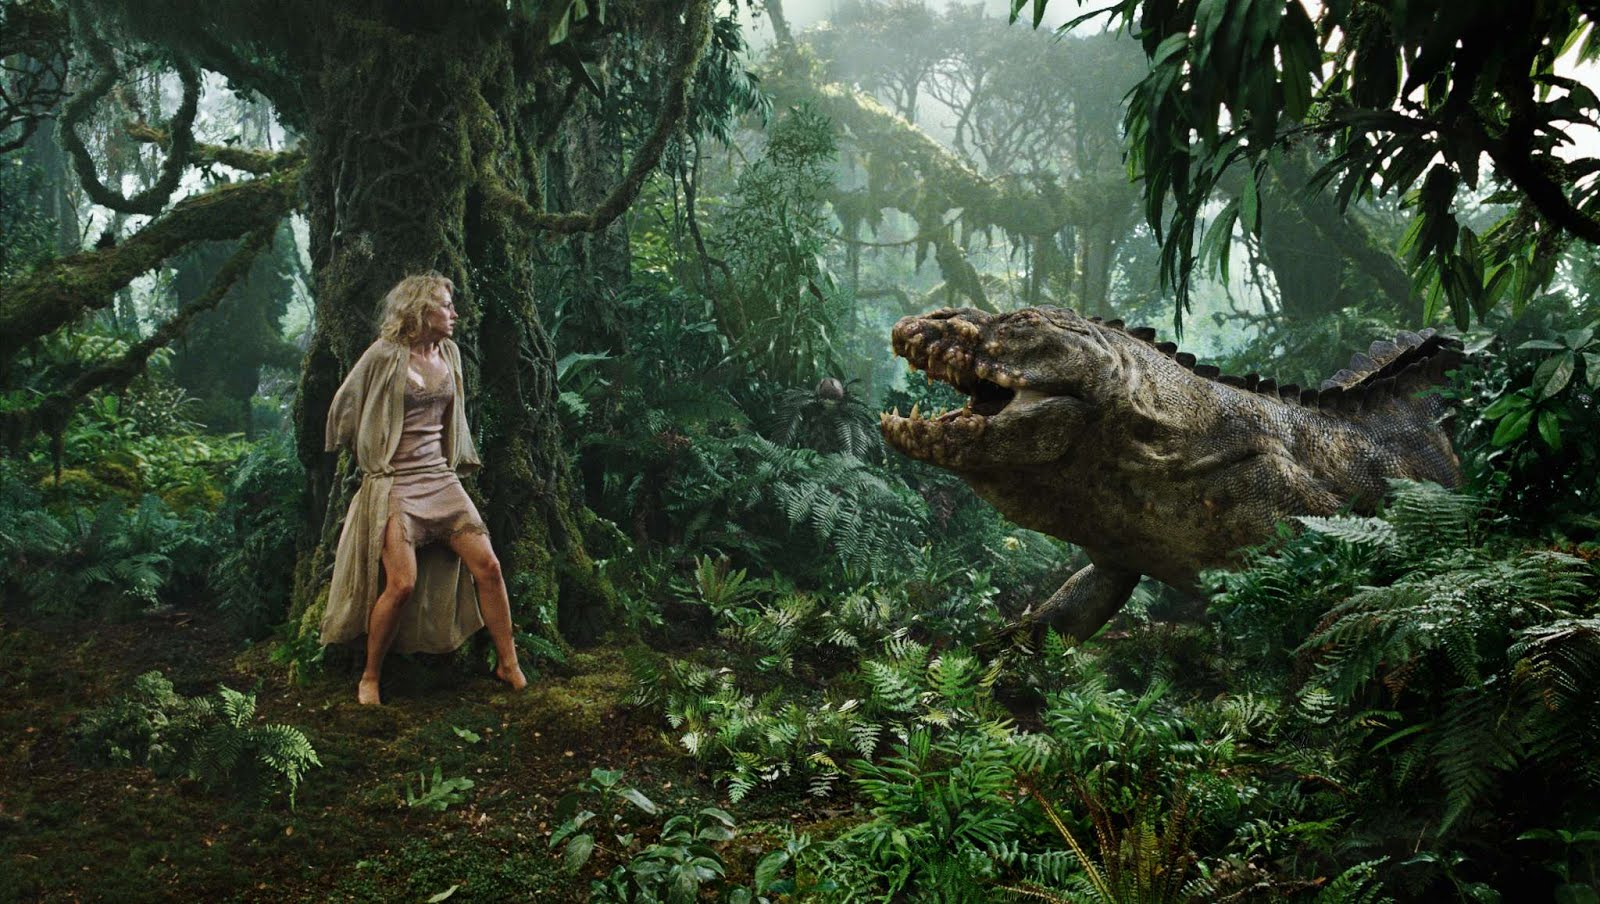 Alien Tower: Kong: Skull Island versus Peter Jackson's King Kong